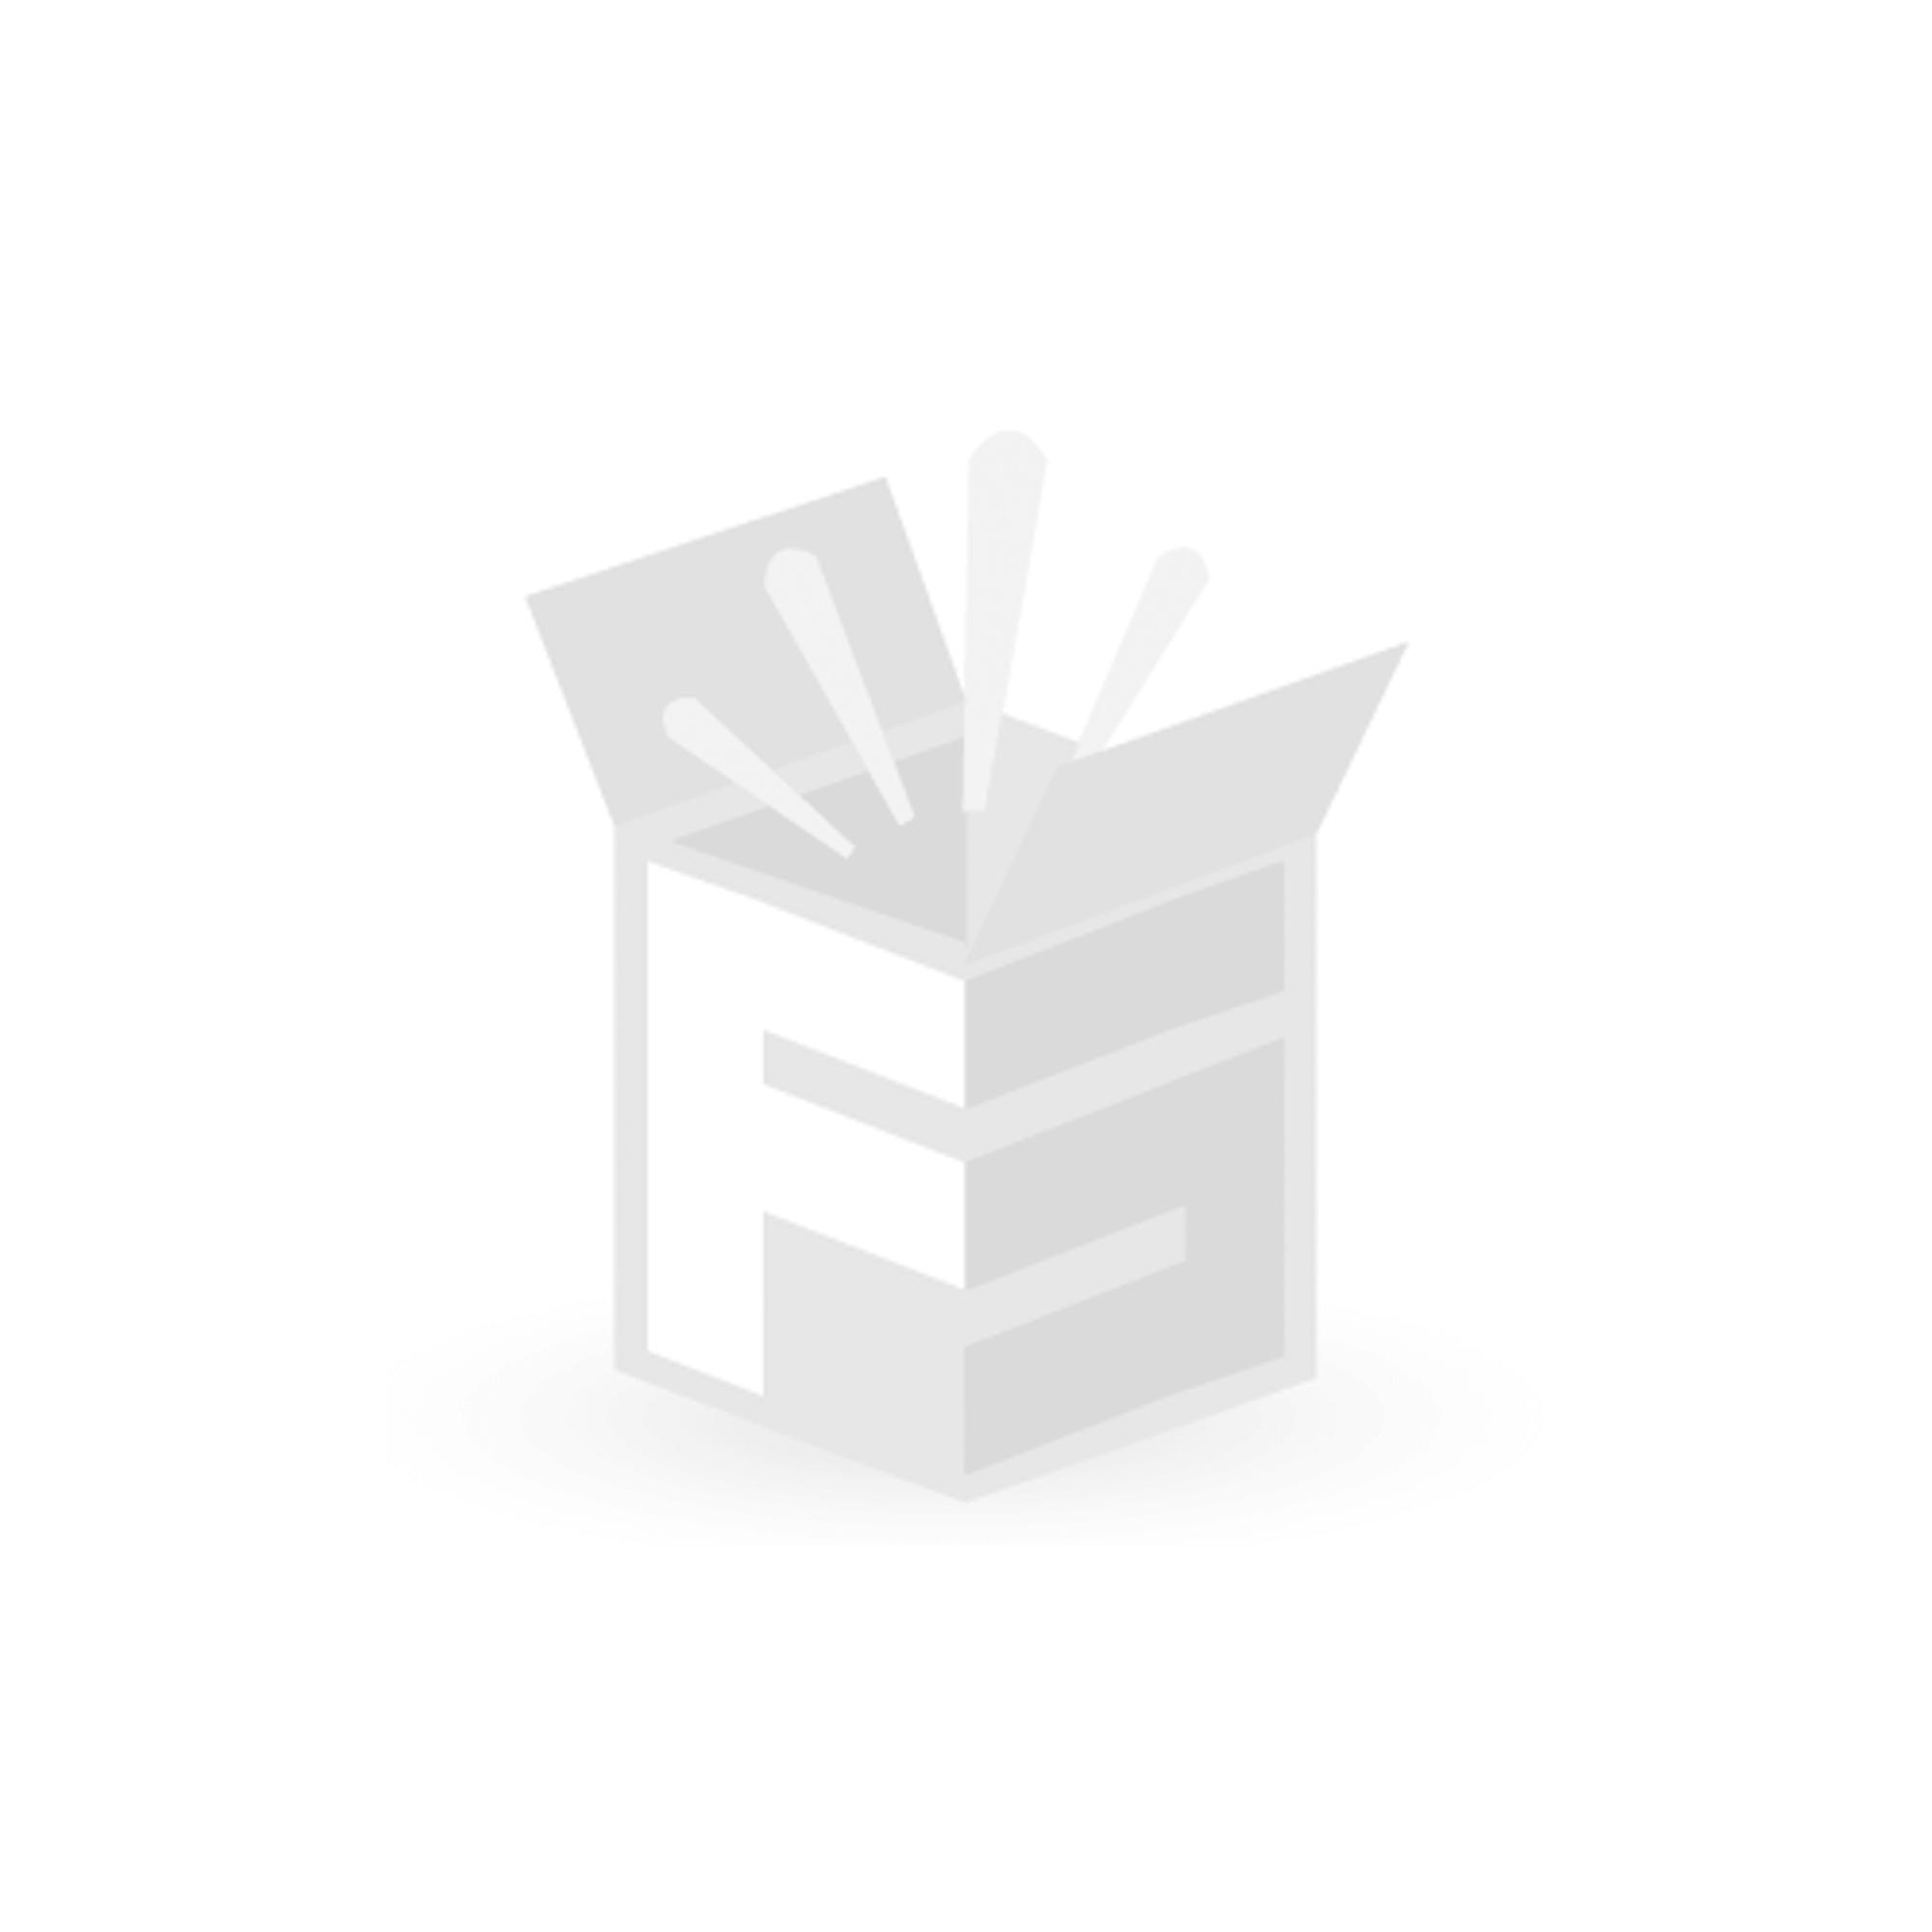 Kibernetik Profi-Eiswürfelmaschine 28kg/Tag, 6kg Speicher Vollwürfel